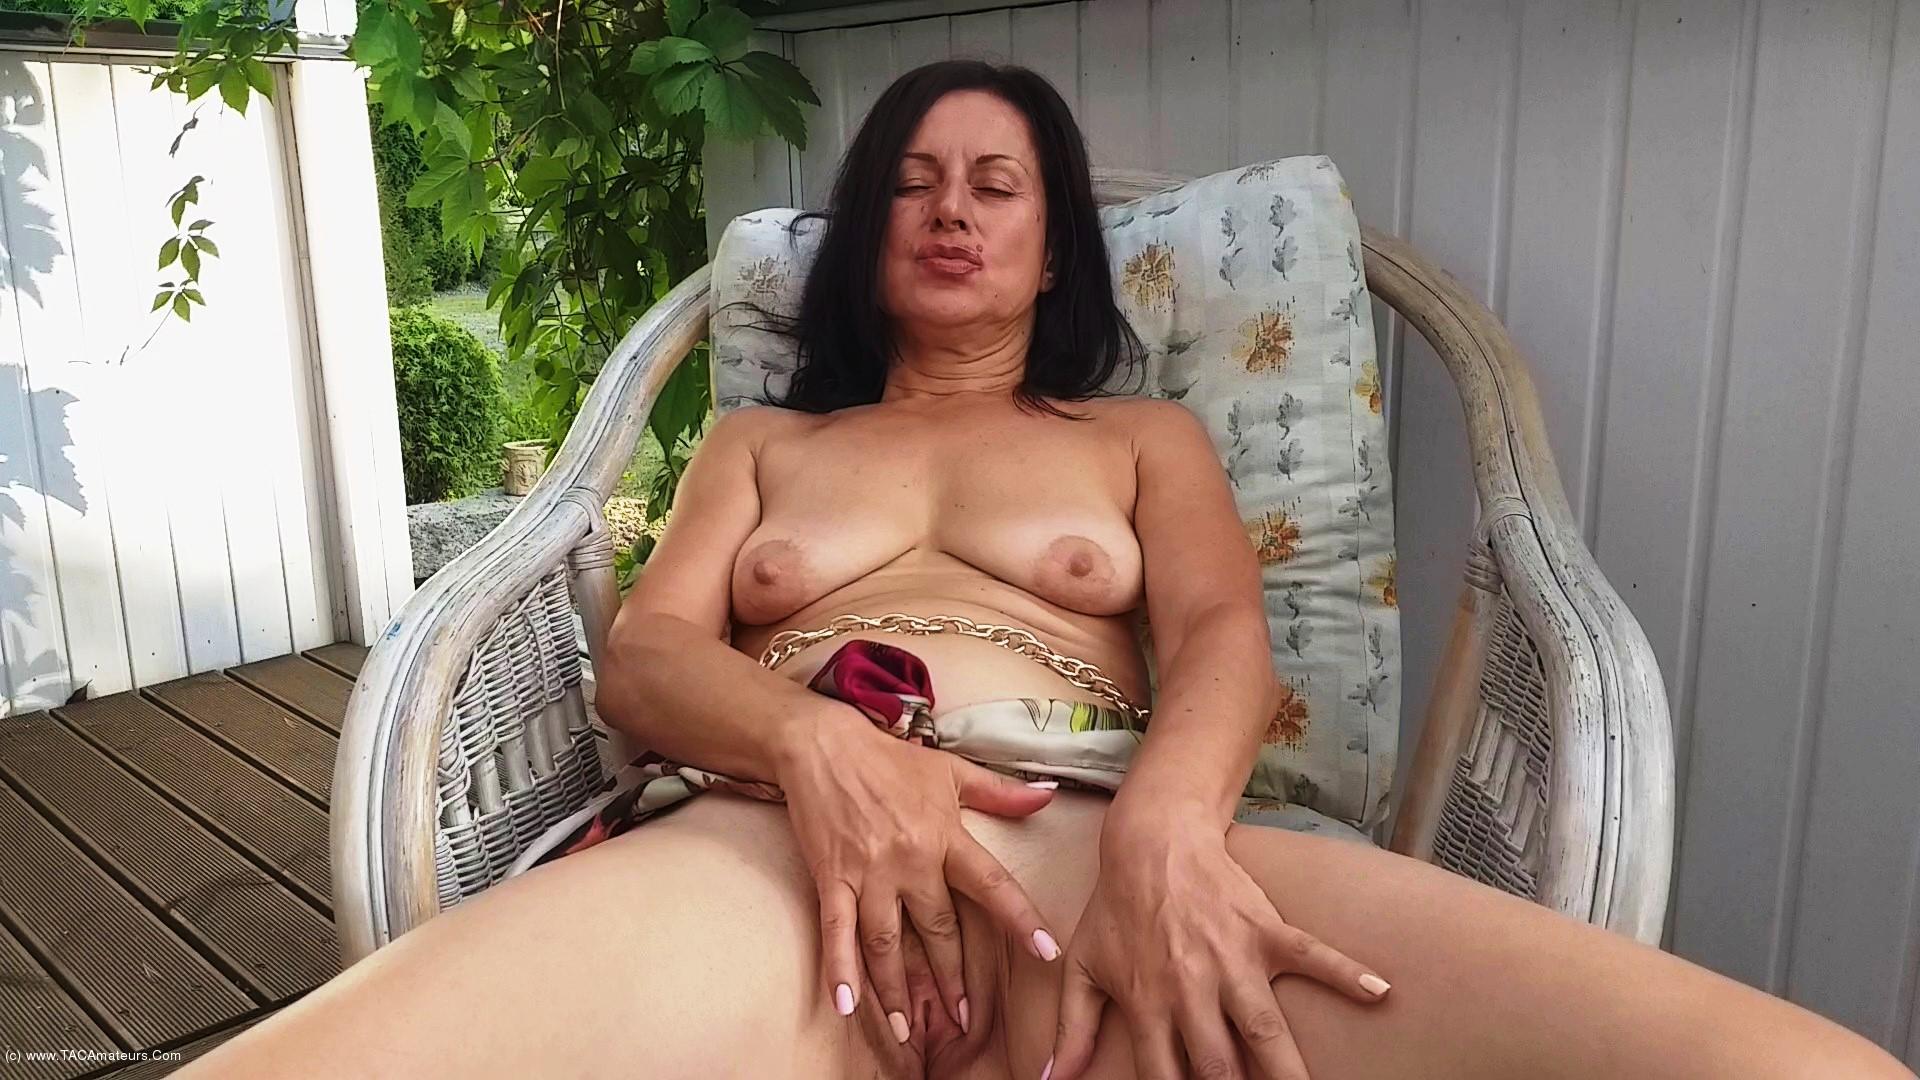 DianaAnanta - Outdoor Masturbation scene 3